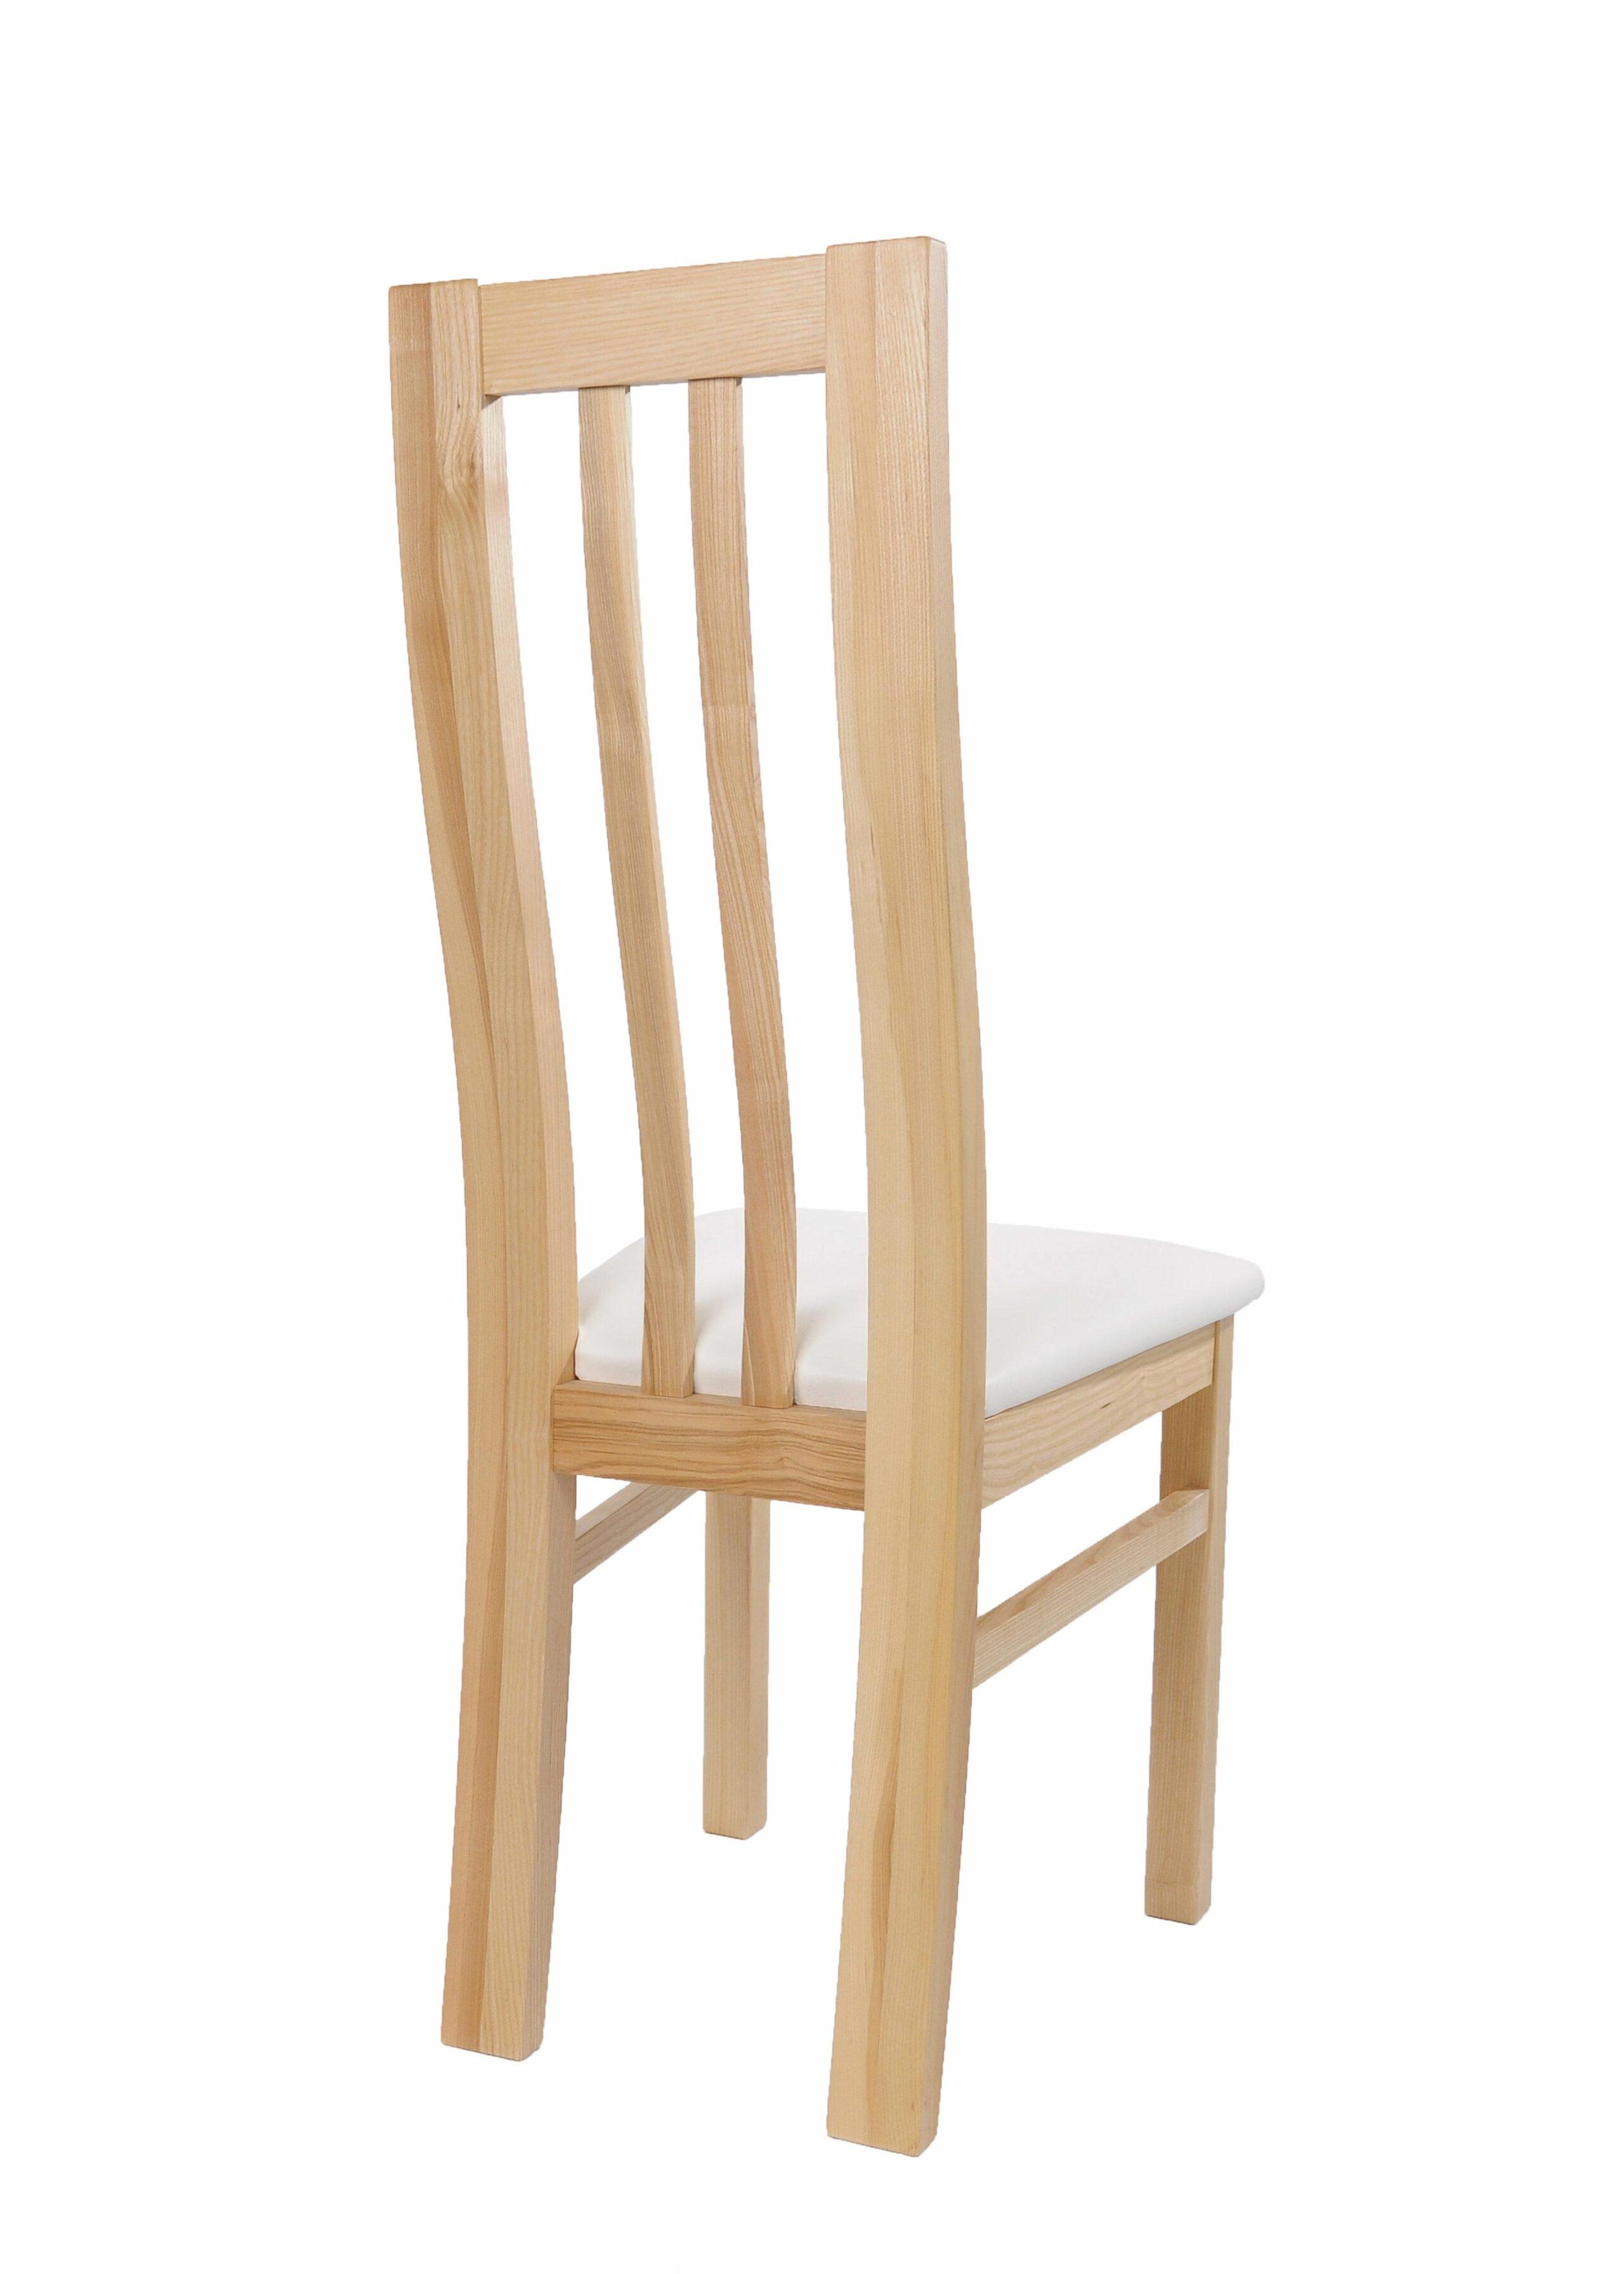 Masívne jaseňová stolička Oslo s bielou koženkou